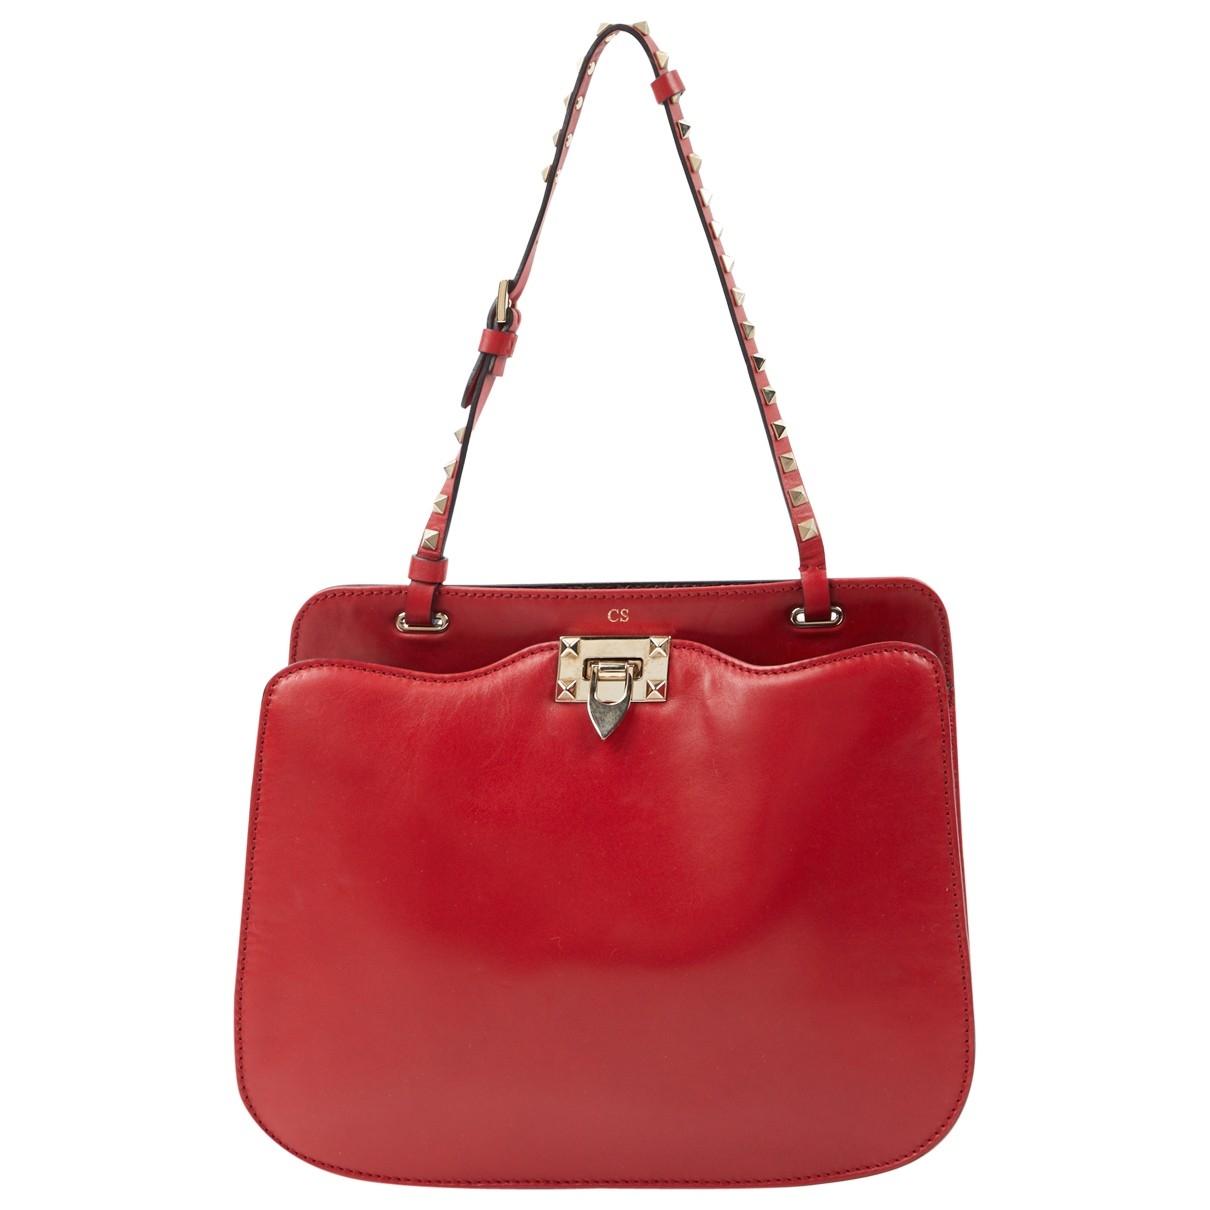 Valentino Garavani \N Red Leather handbag for Women \N